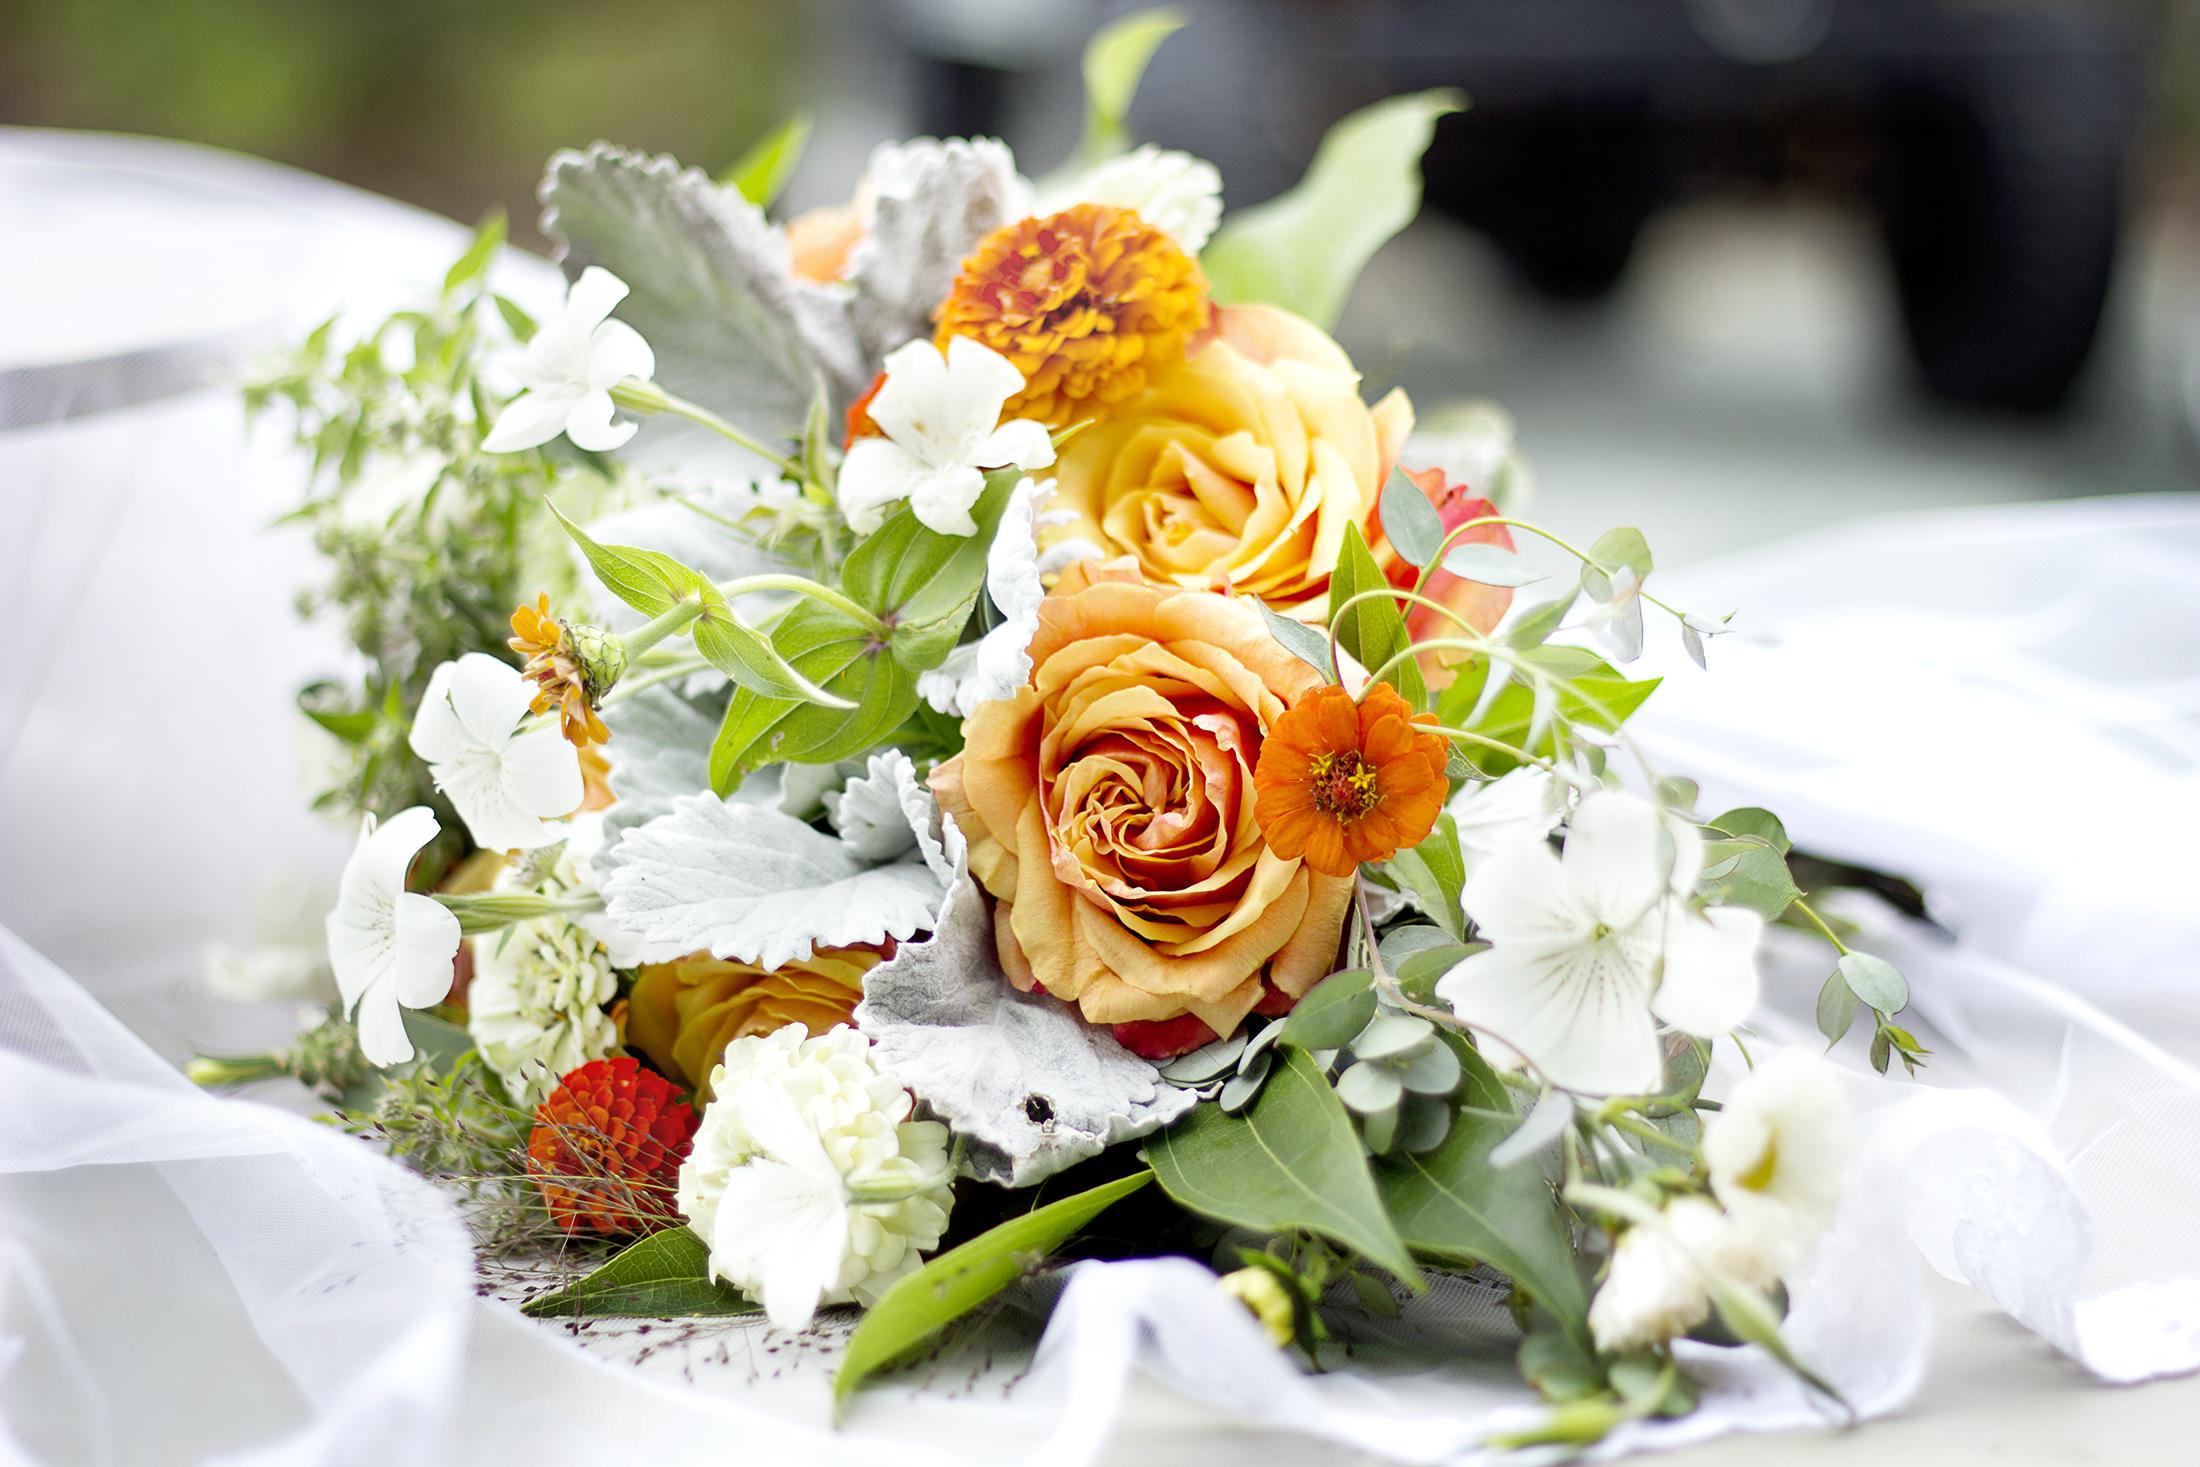 reduced_ss_bridal_bouquet_orange_roses_agrostemma_dusty_miller.jpg